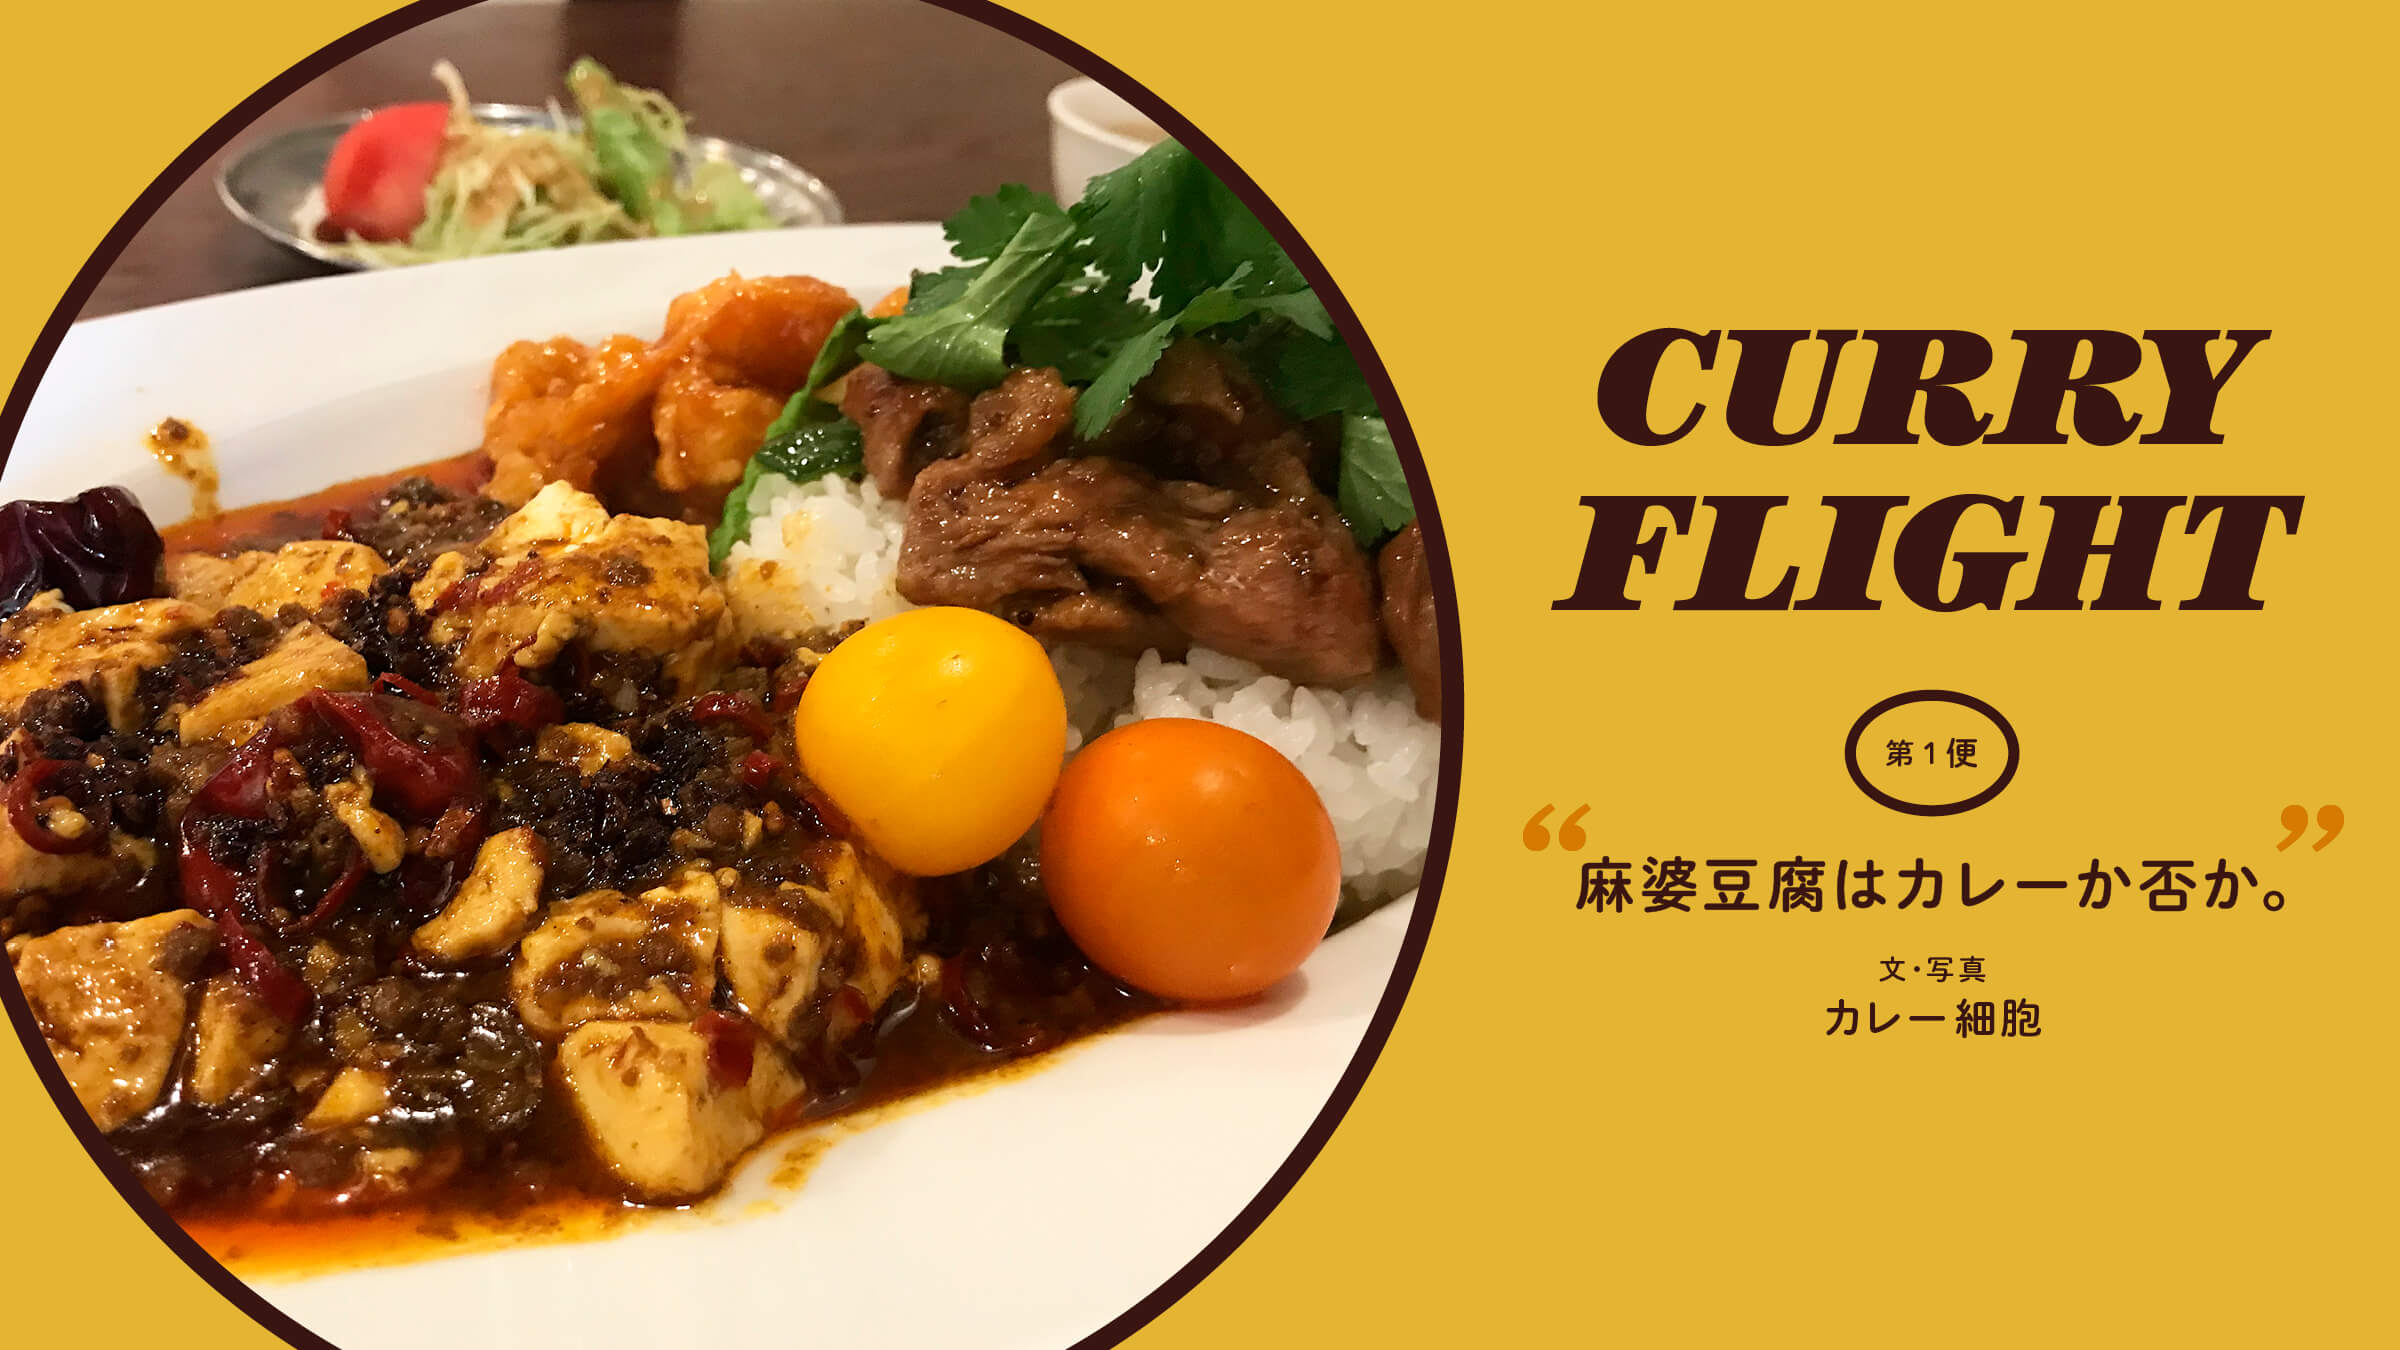 curry_Brand_2400_1300.jpg